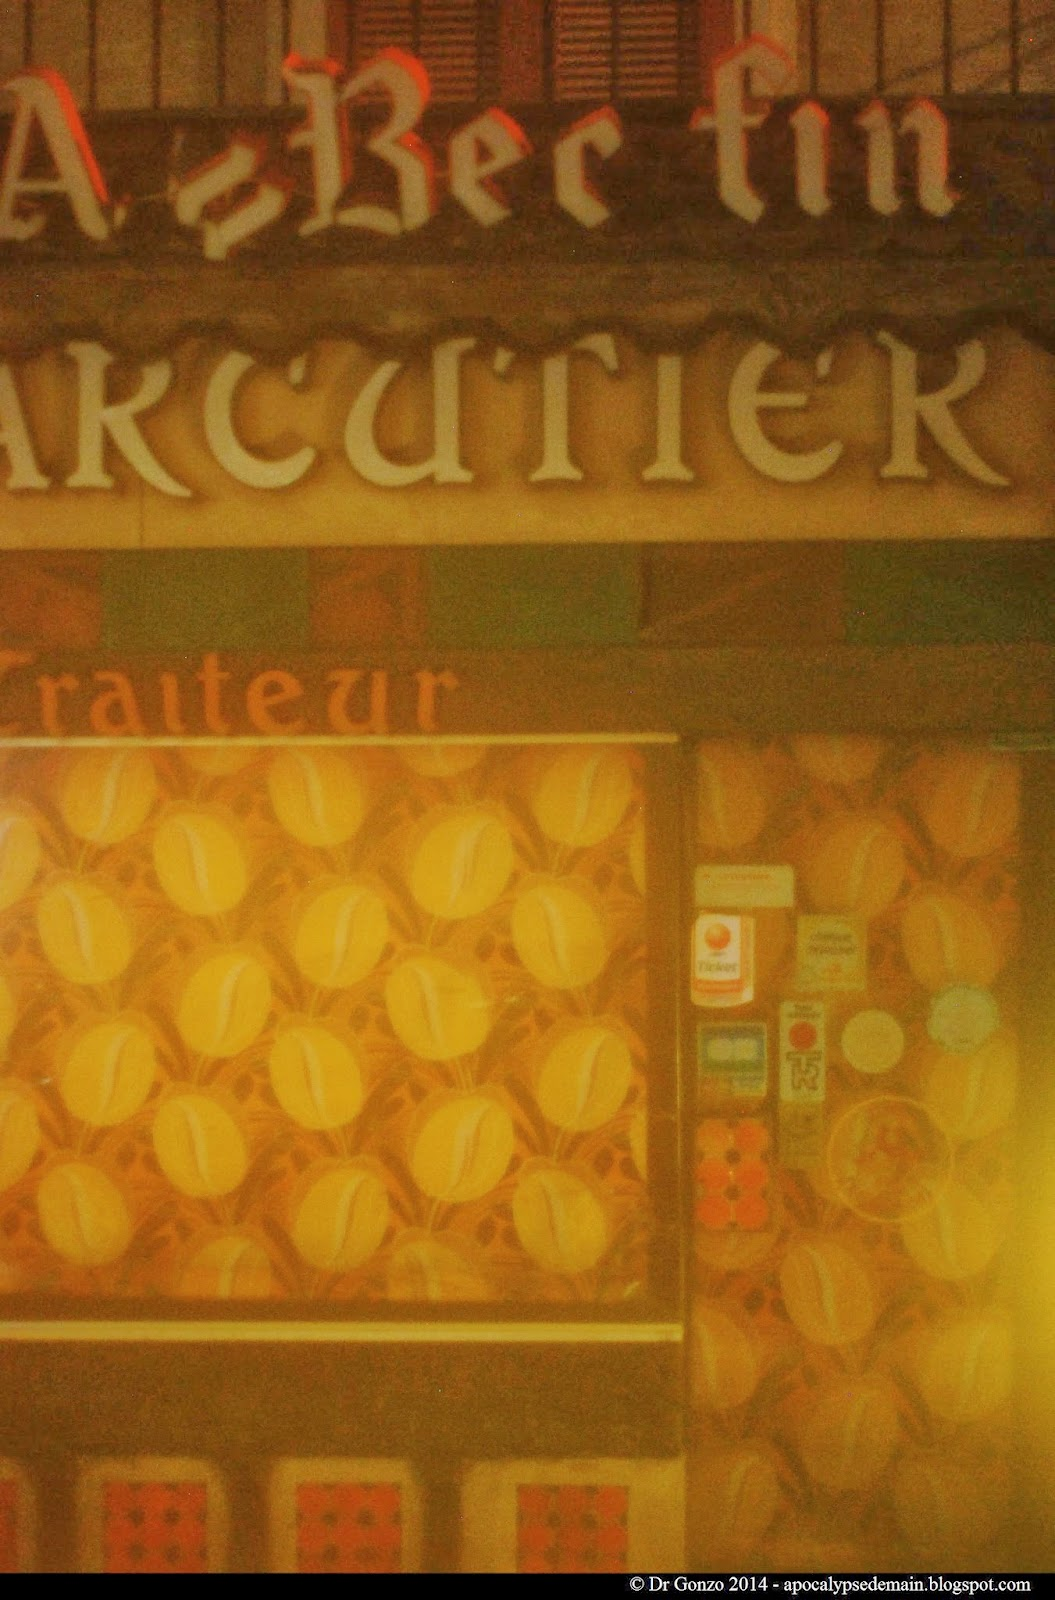 Boucher-Traiteur-Brassens-Banlieue-Faubourg-kitsch